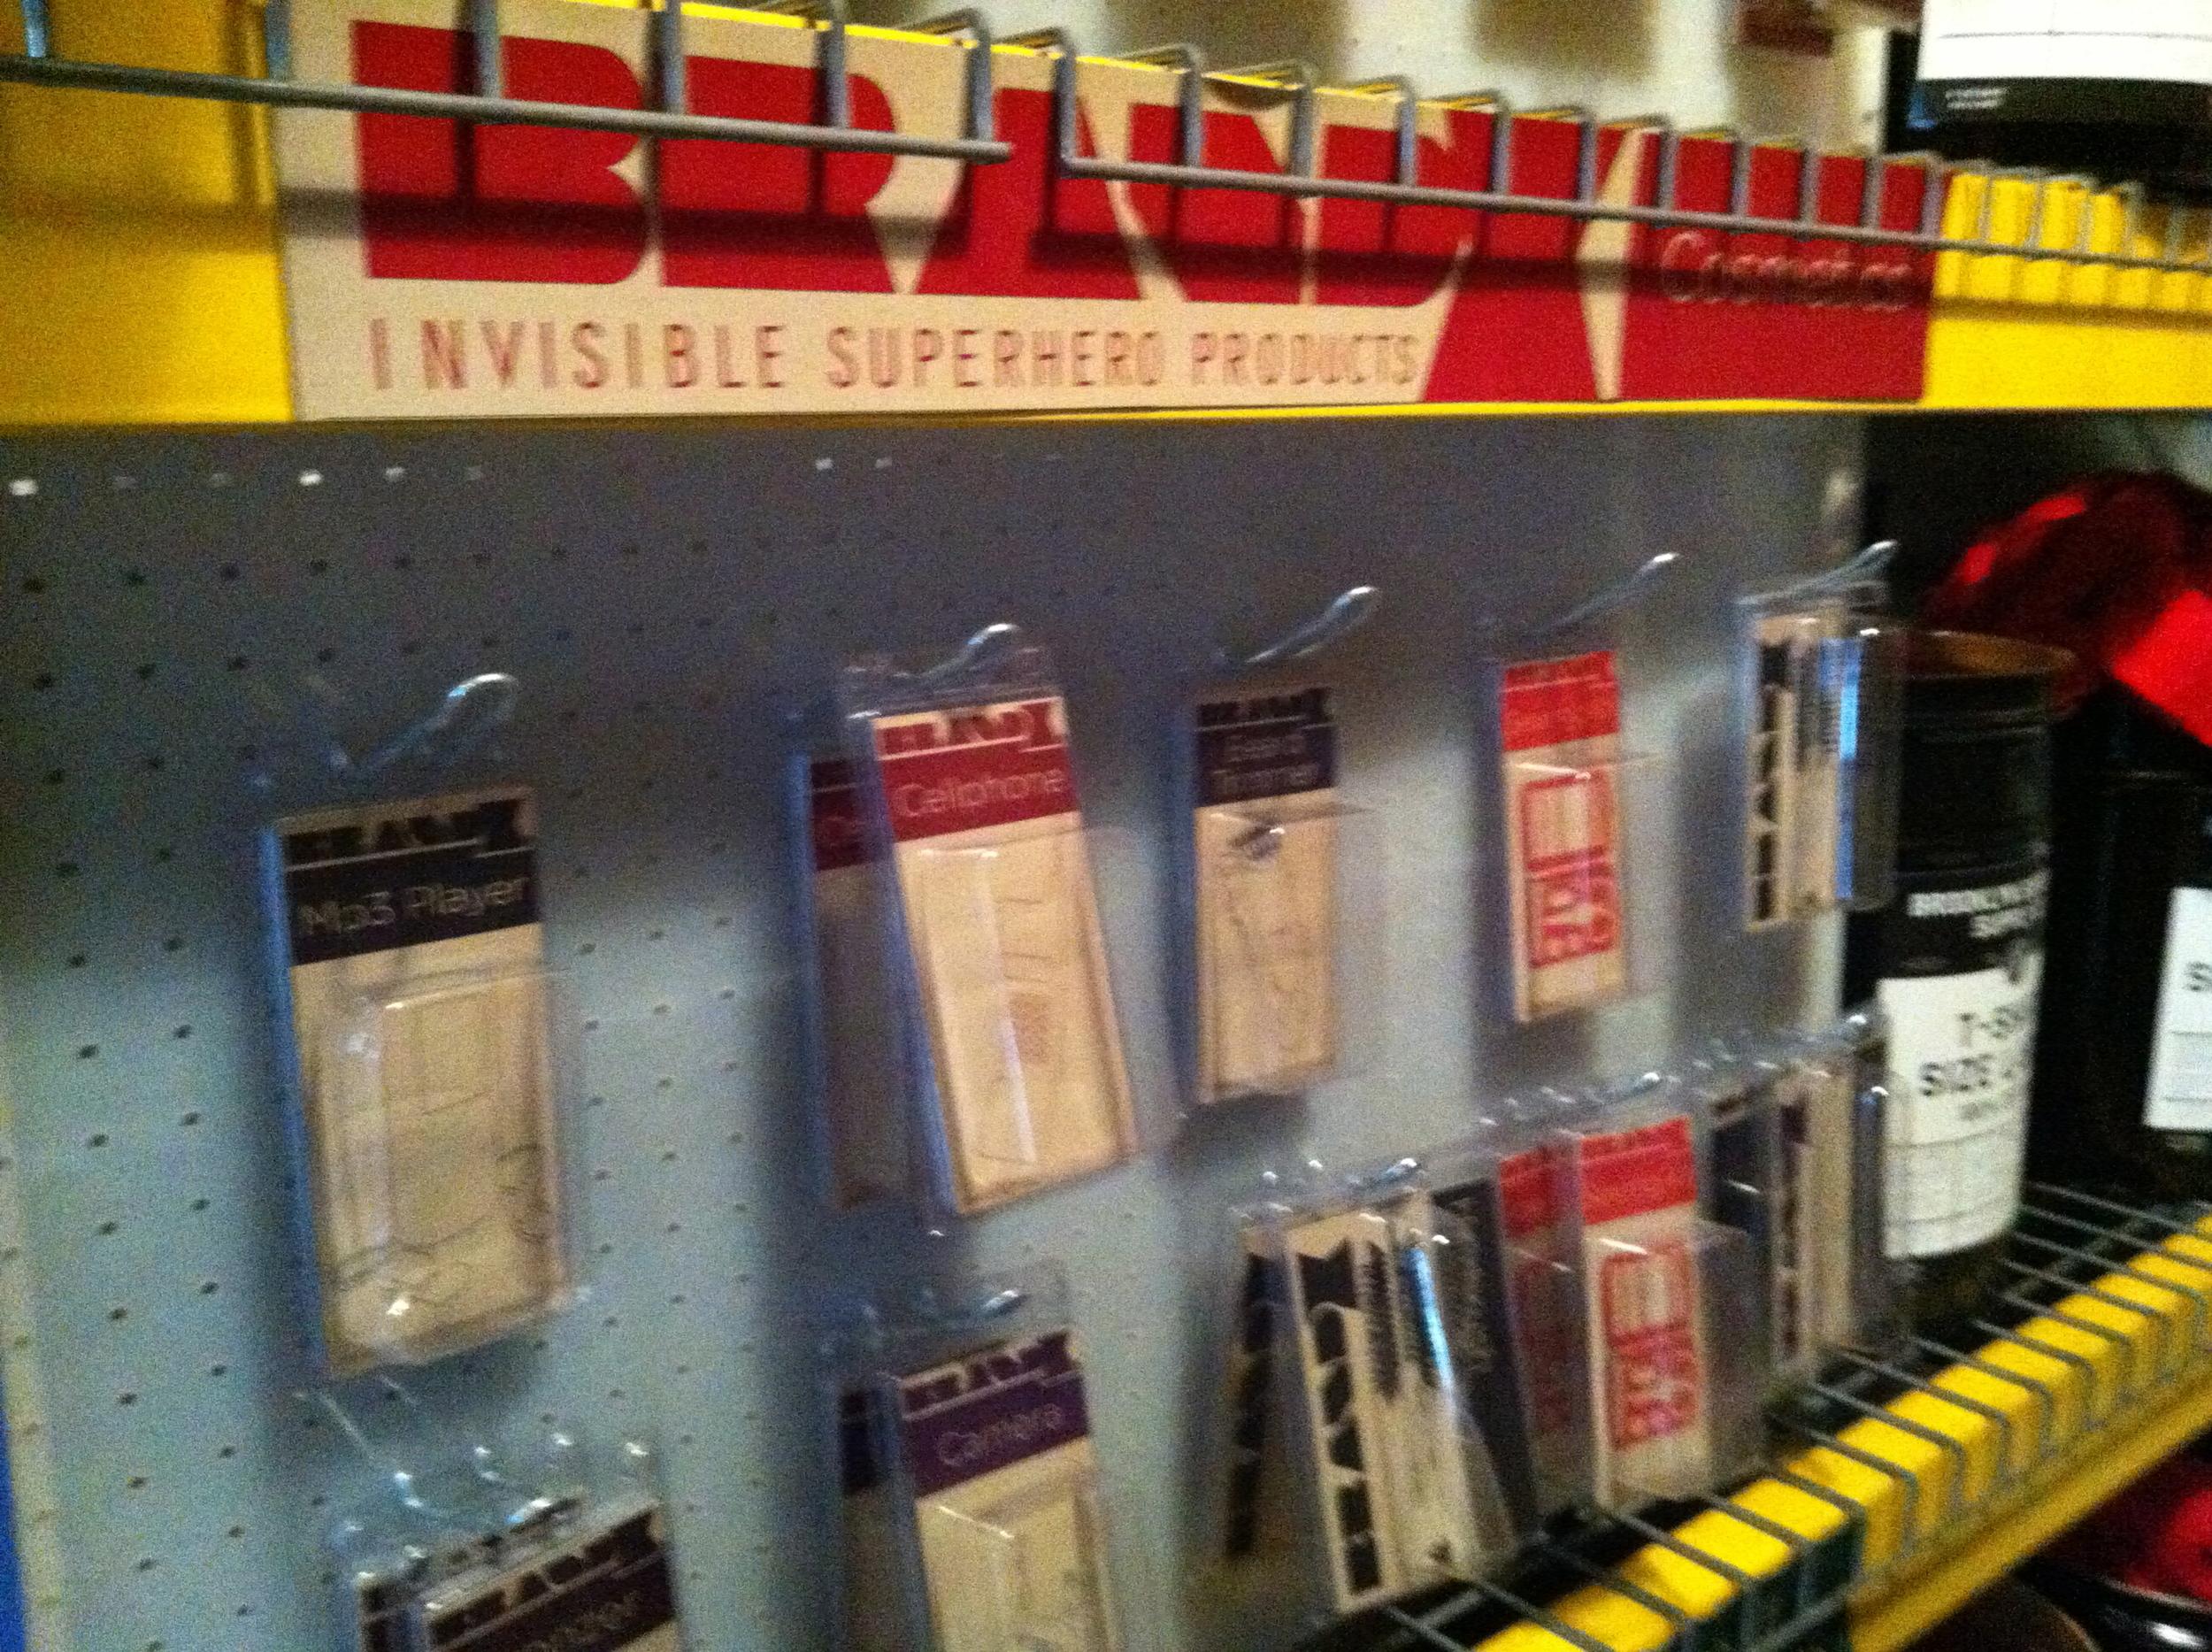 I was devillainized at the Brooklyn Superhero Supply Co.